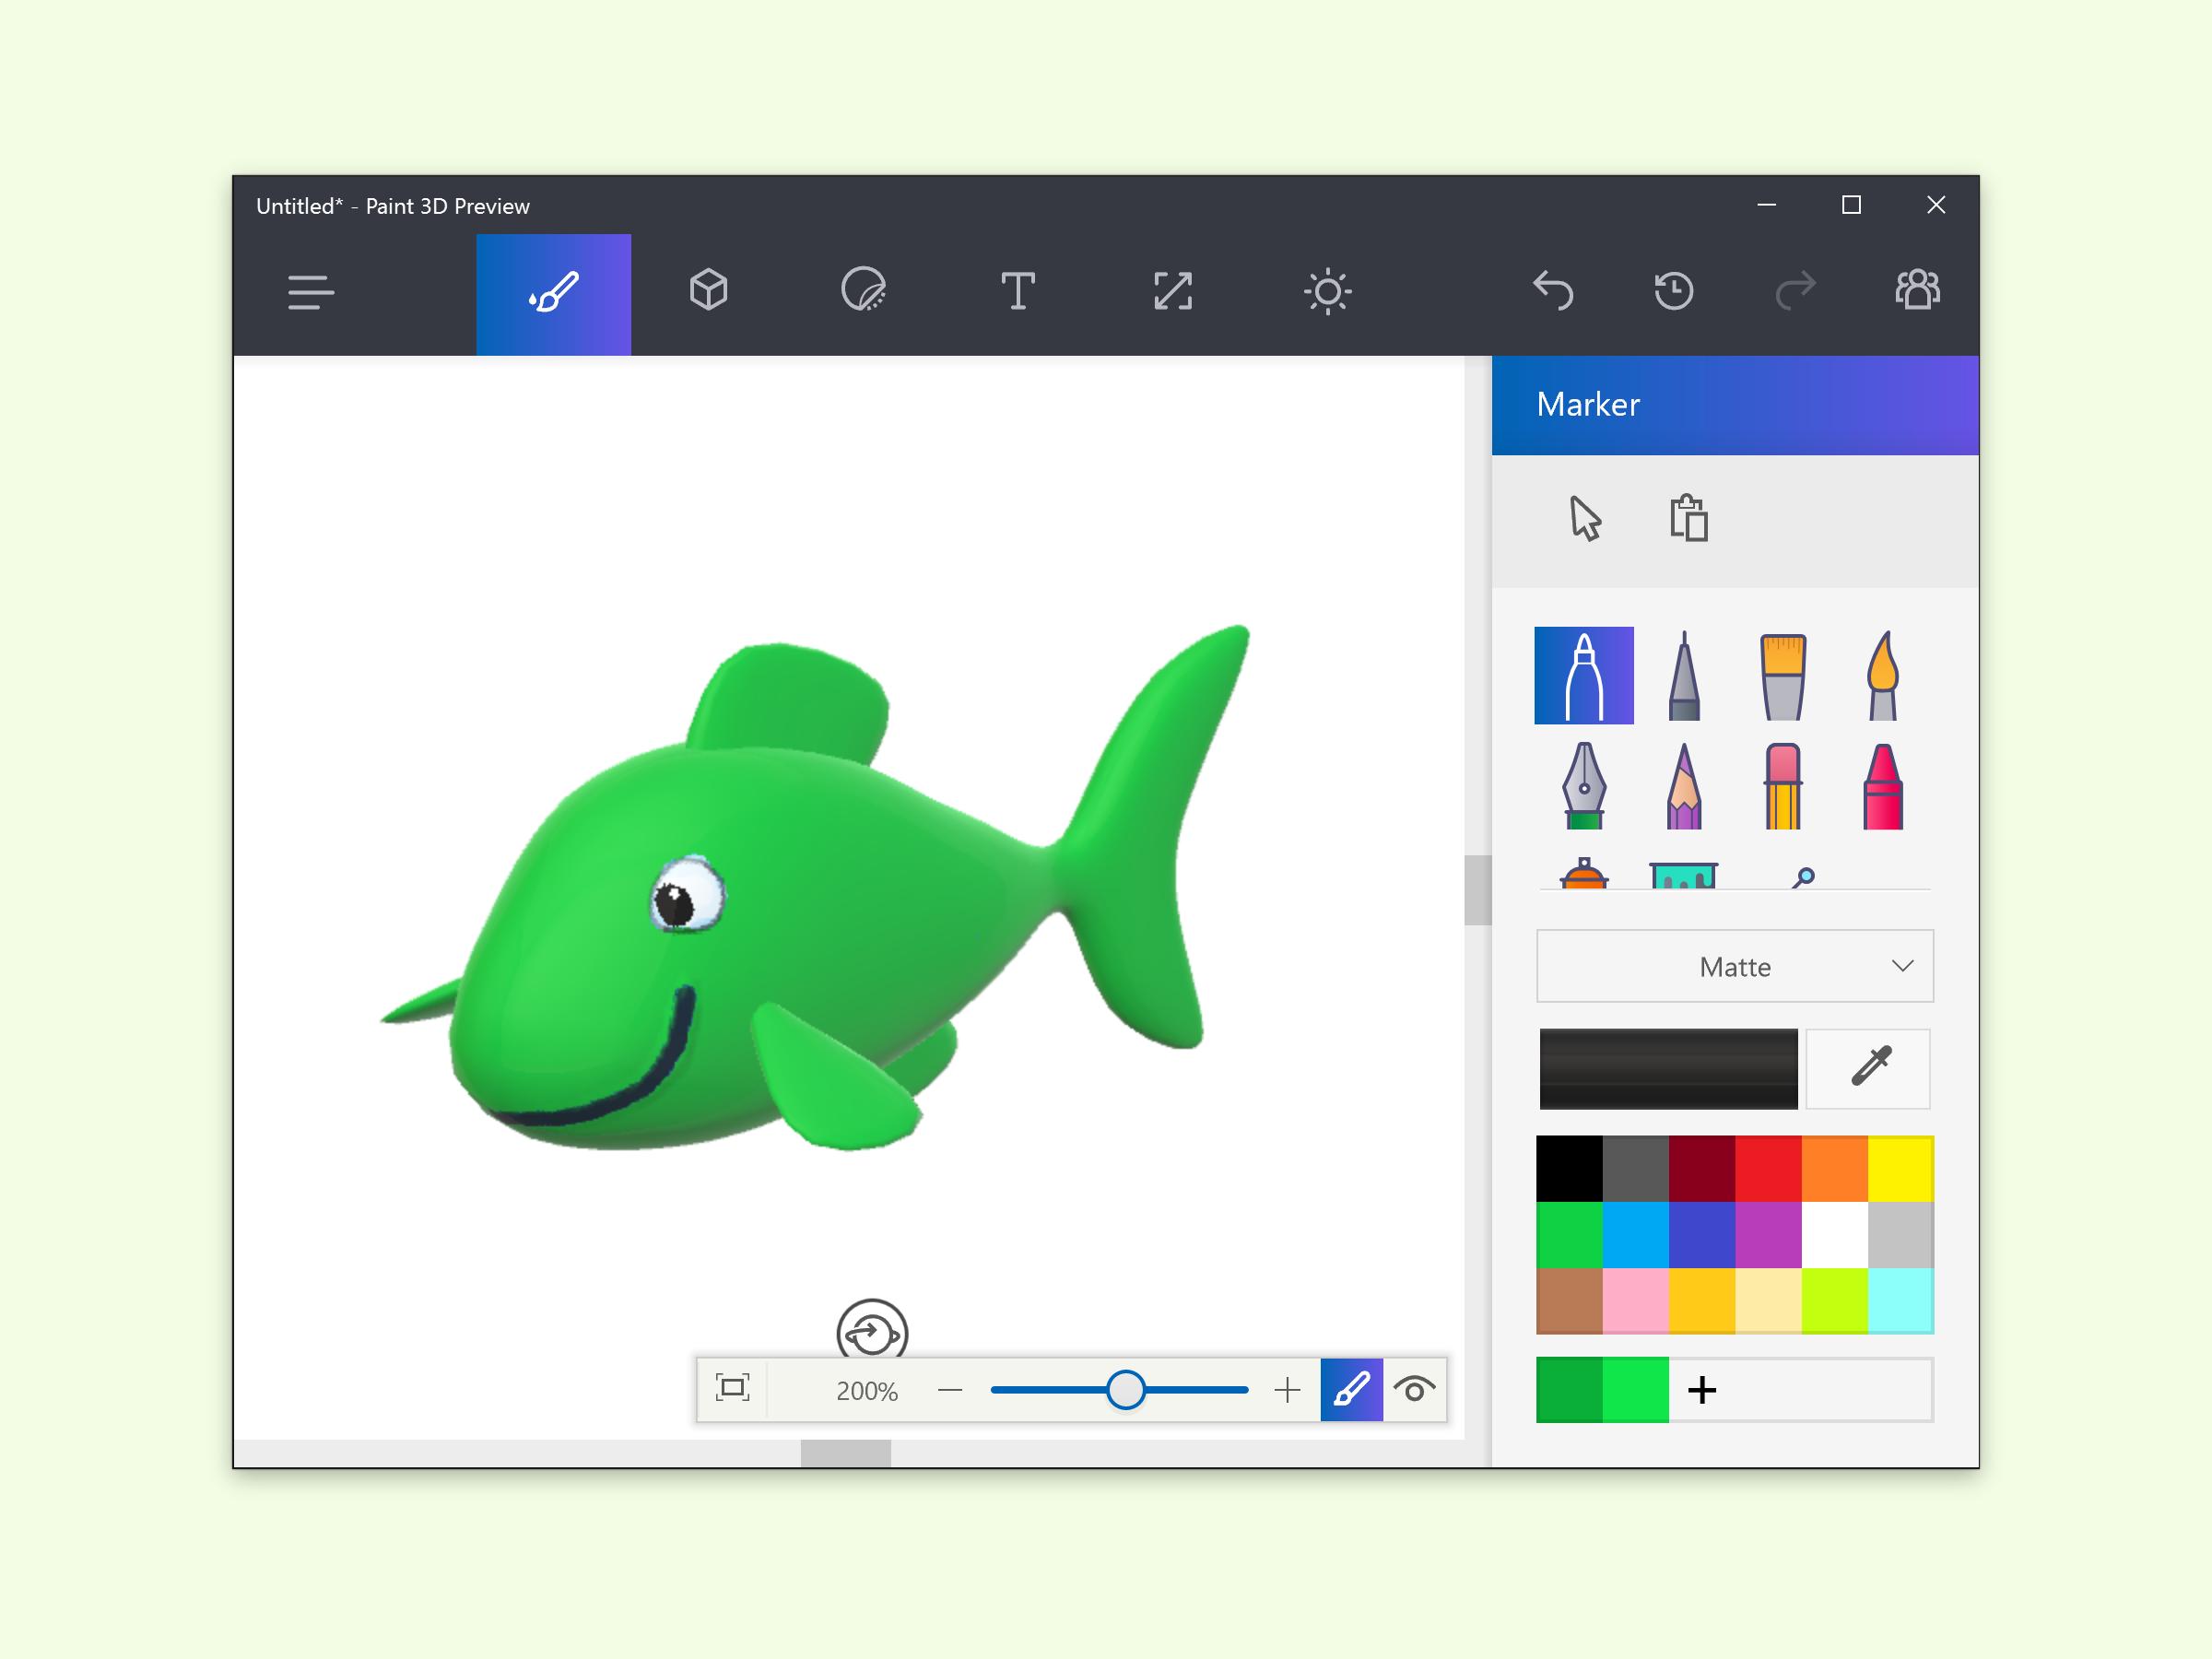 Gratis 3d version von microsoft paint jetzt ausprobieren for Paint 3d microsoft